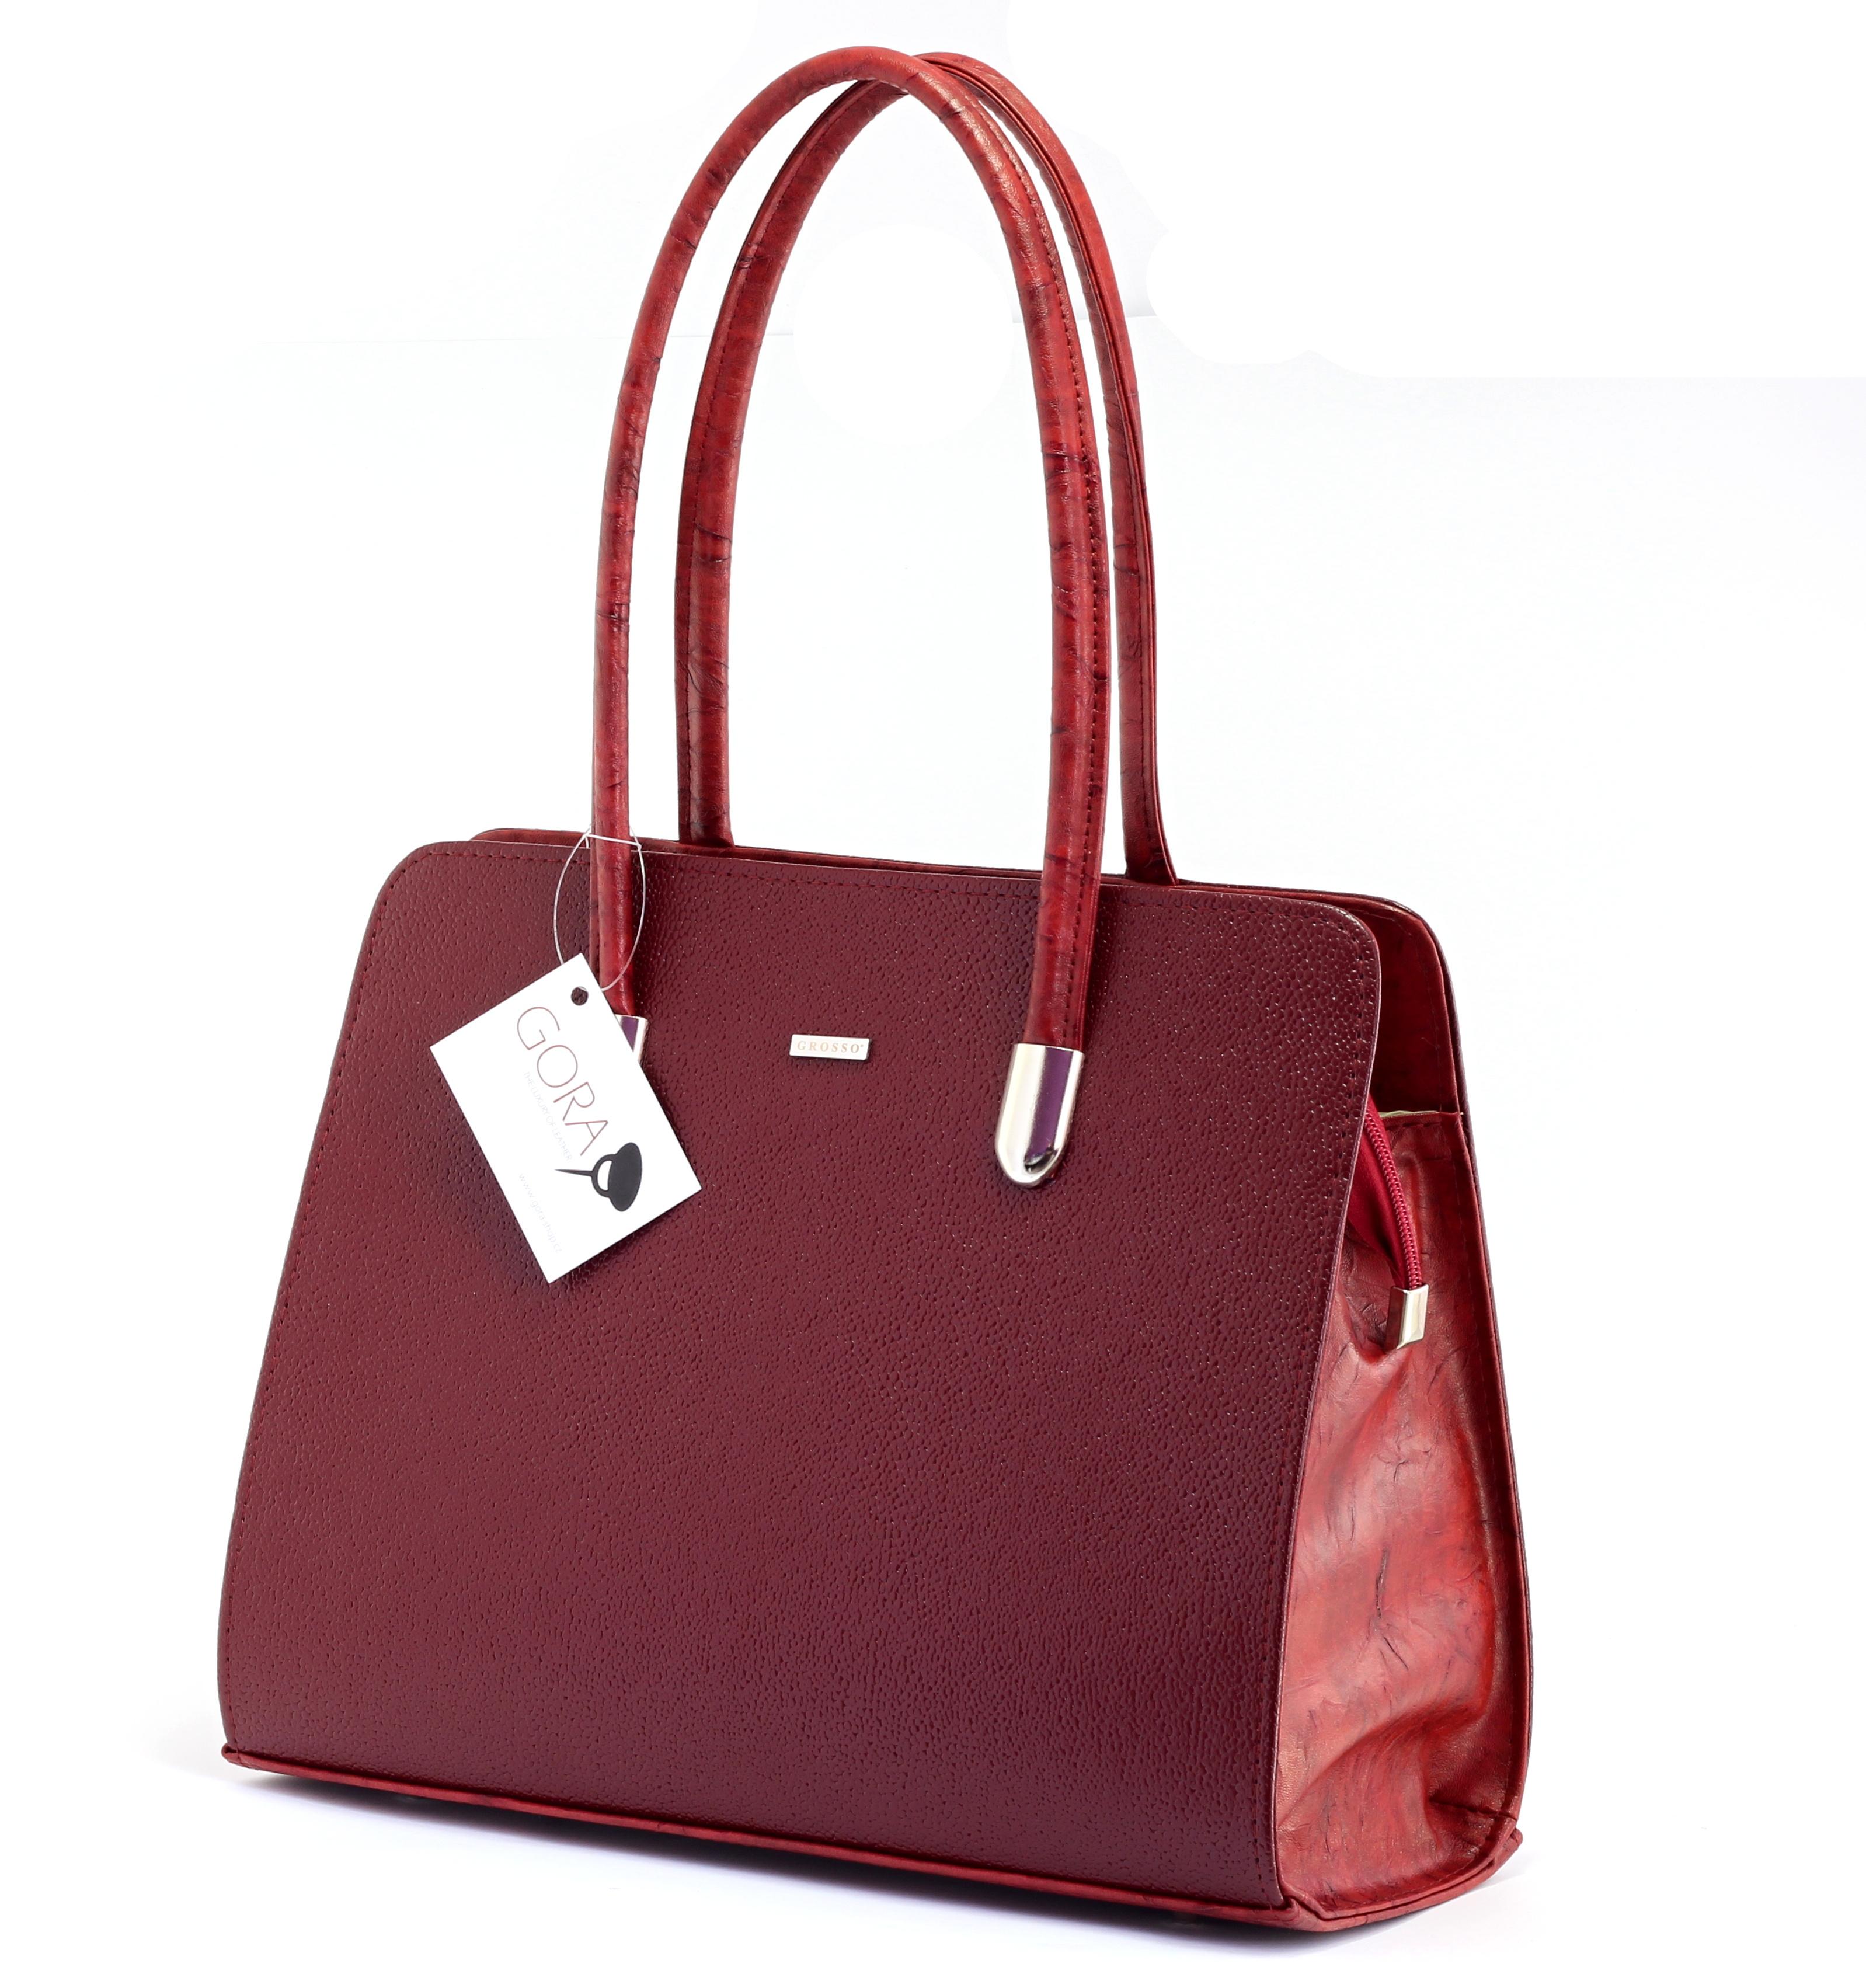 Dámska hranatá kabelka GROSSO - červená  71e5d11d8b5